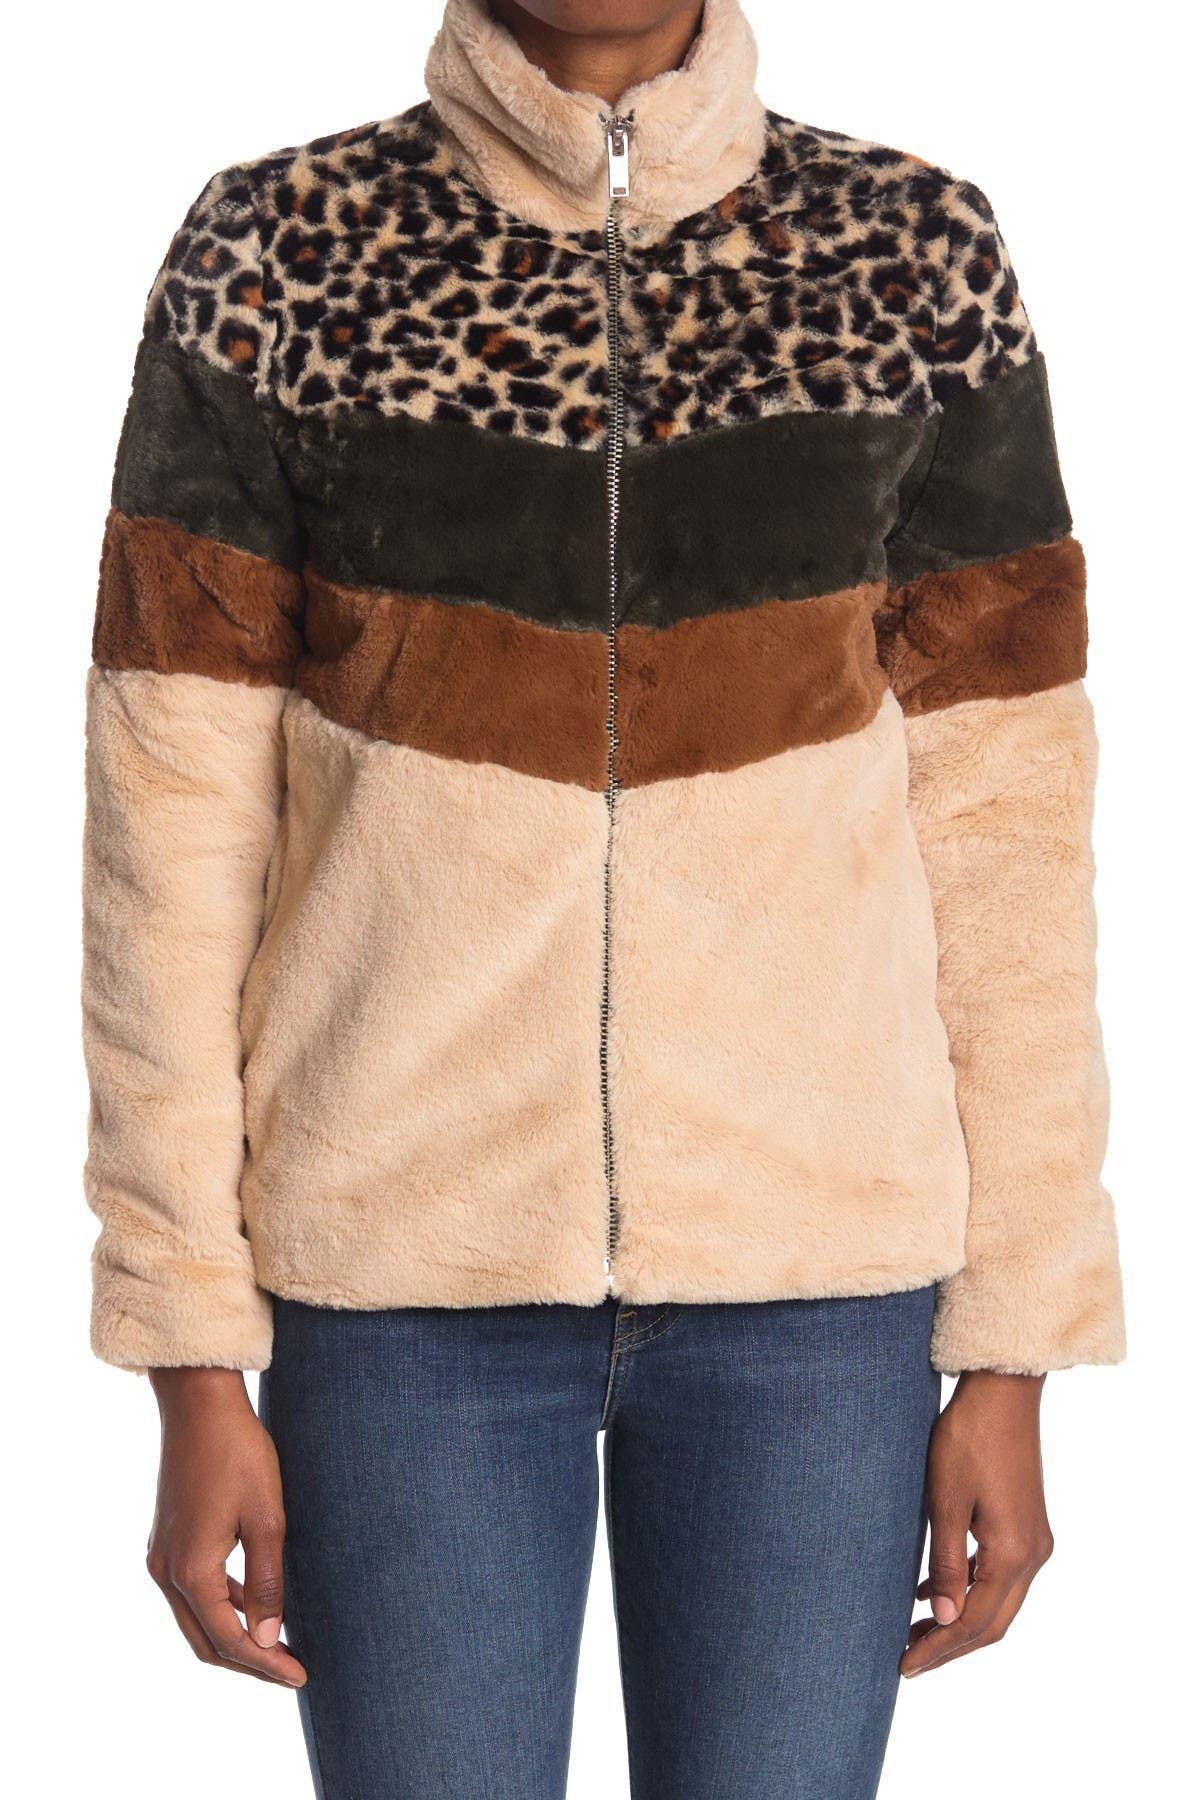 Image of Coffee Shop Faux Fur Colorblock Zip Jacket